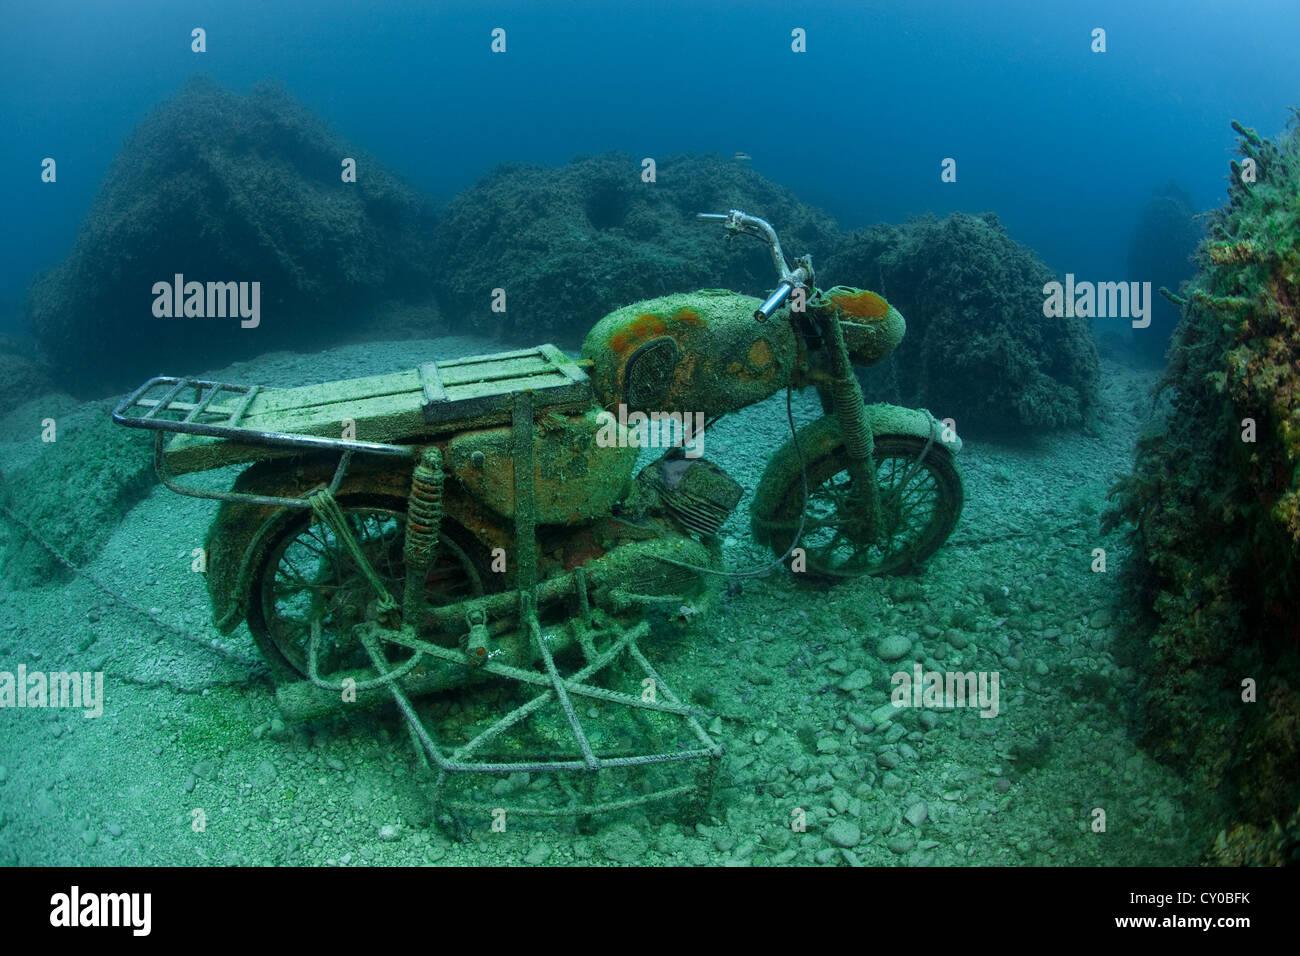 Sunk motorbike, Zakynthos, Greece, Europe - Stock Image